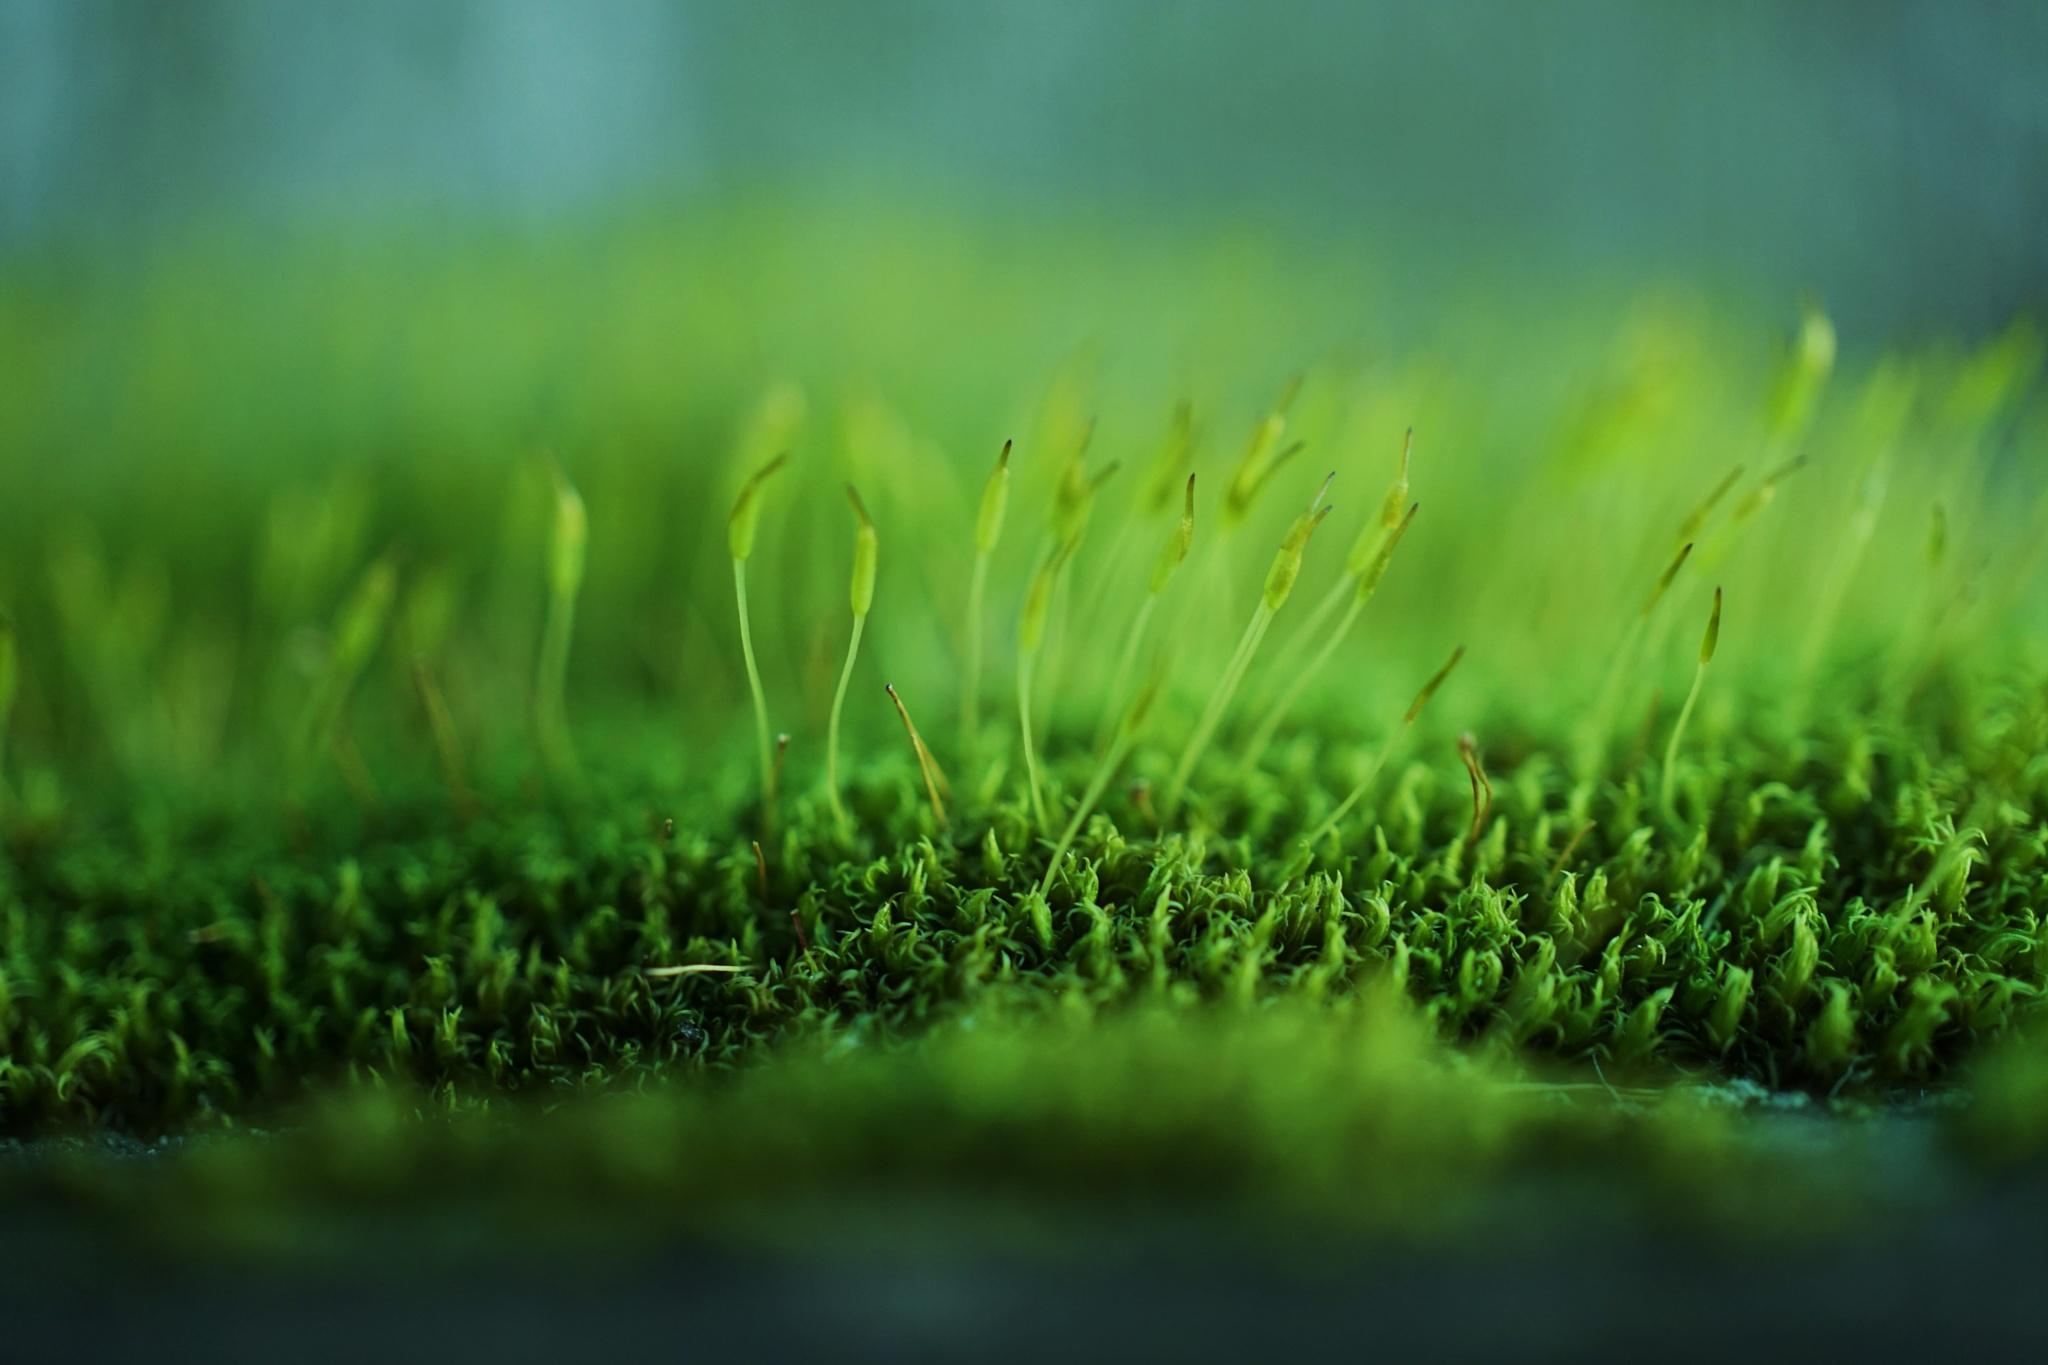 Mossy Green by Gina Hammon